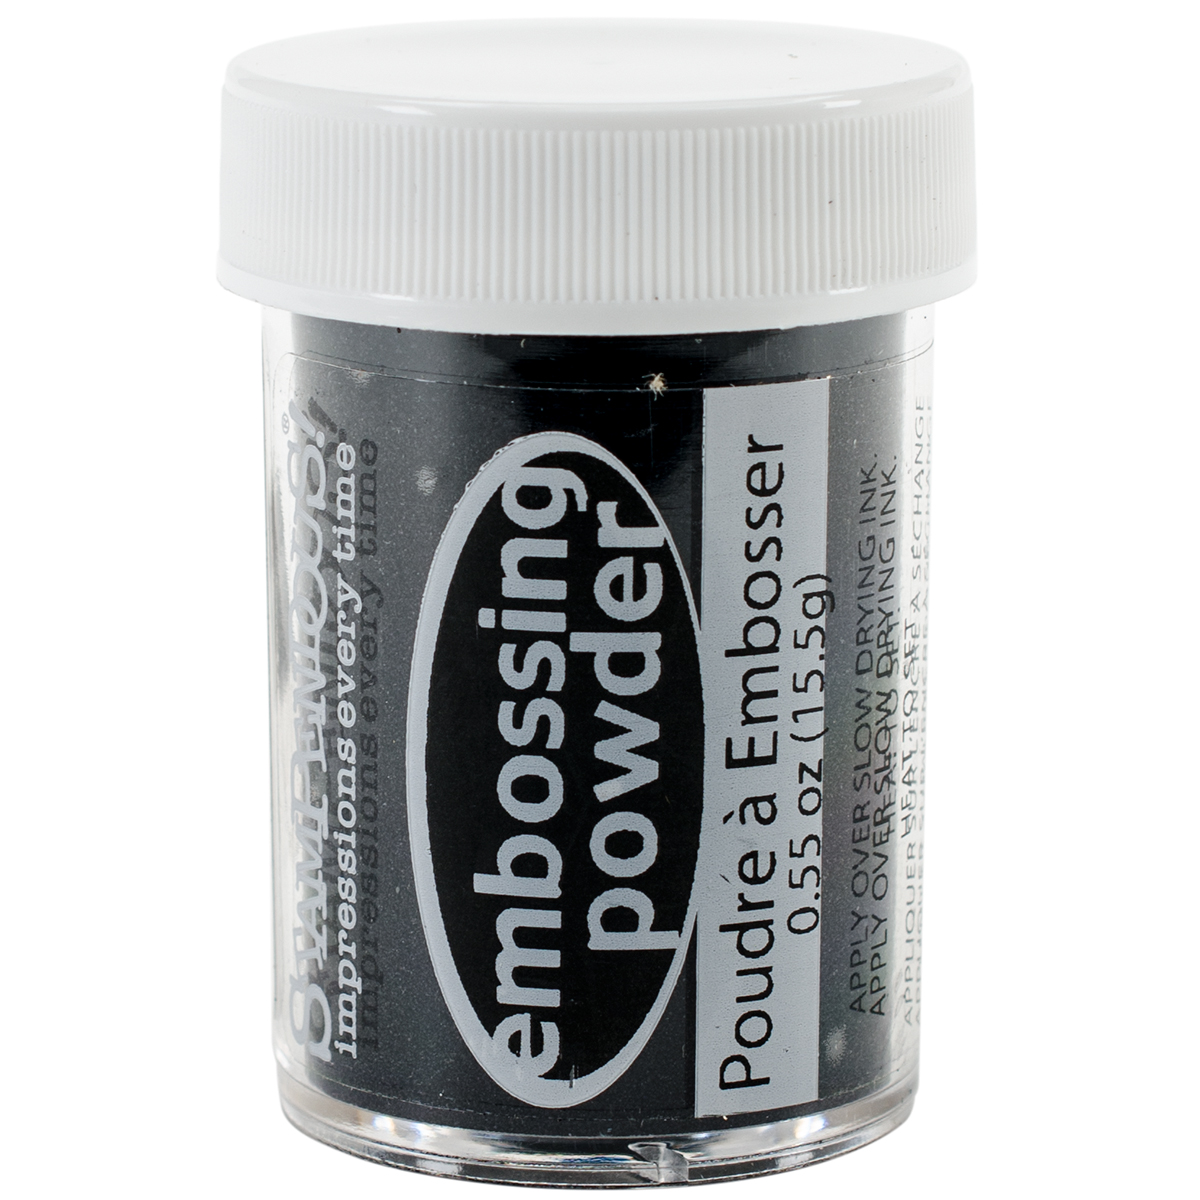 Stampendous Embossing Powder .55oz-Black Opaque